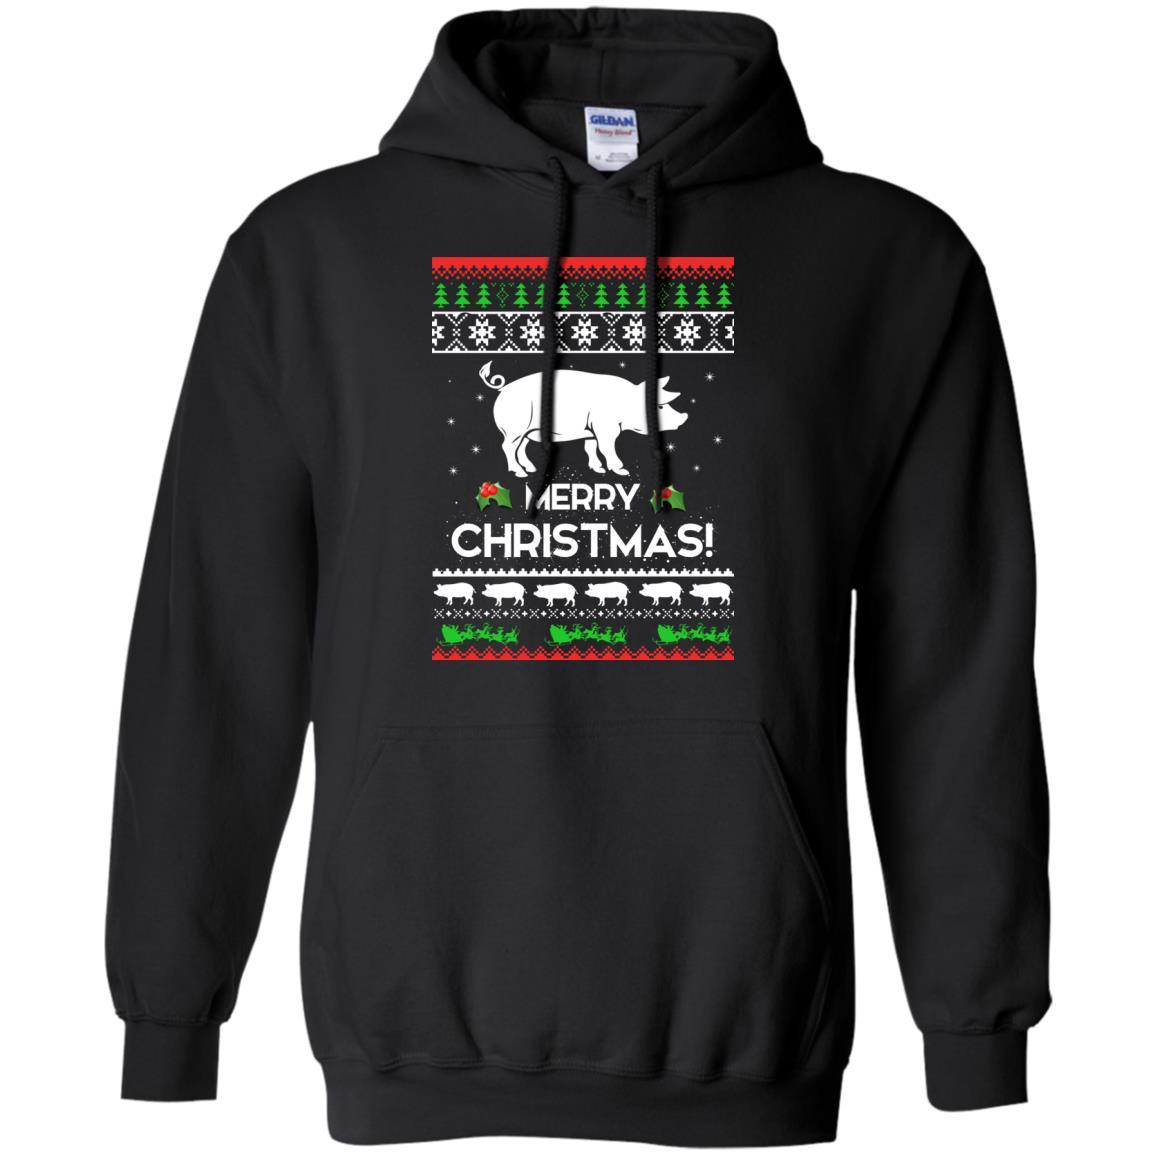 image 3875 - Merry Pigmas Christmas Pig Ugly Sweater, Shirt